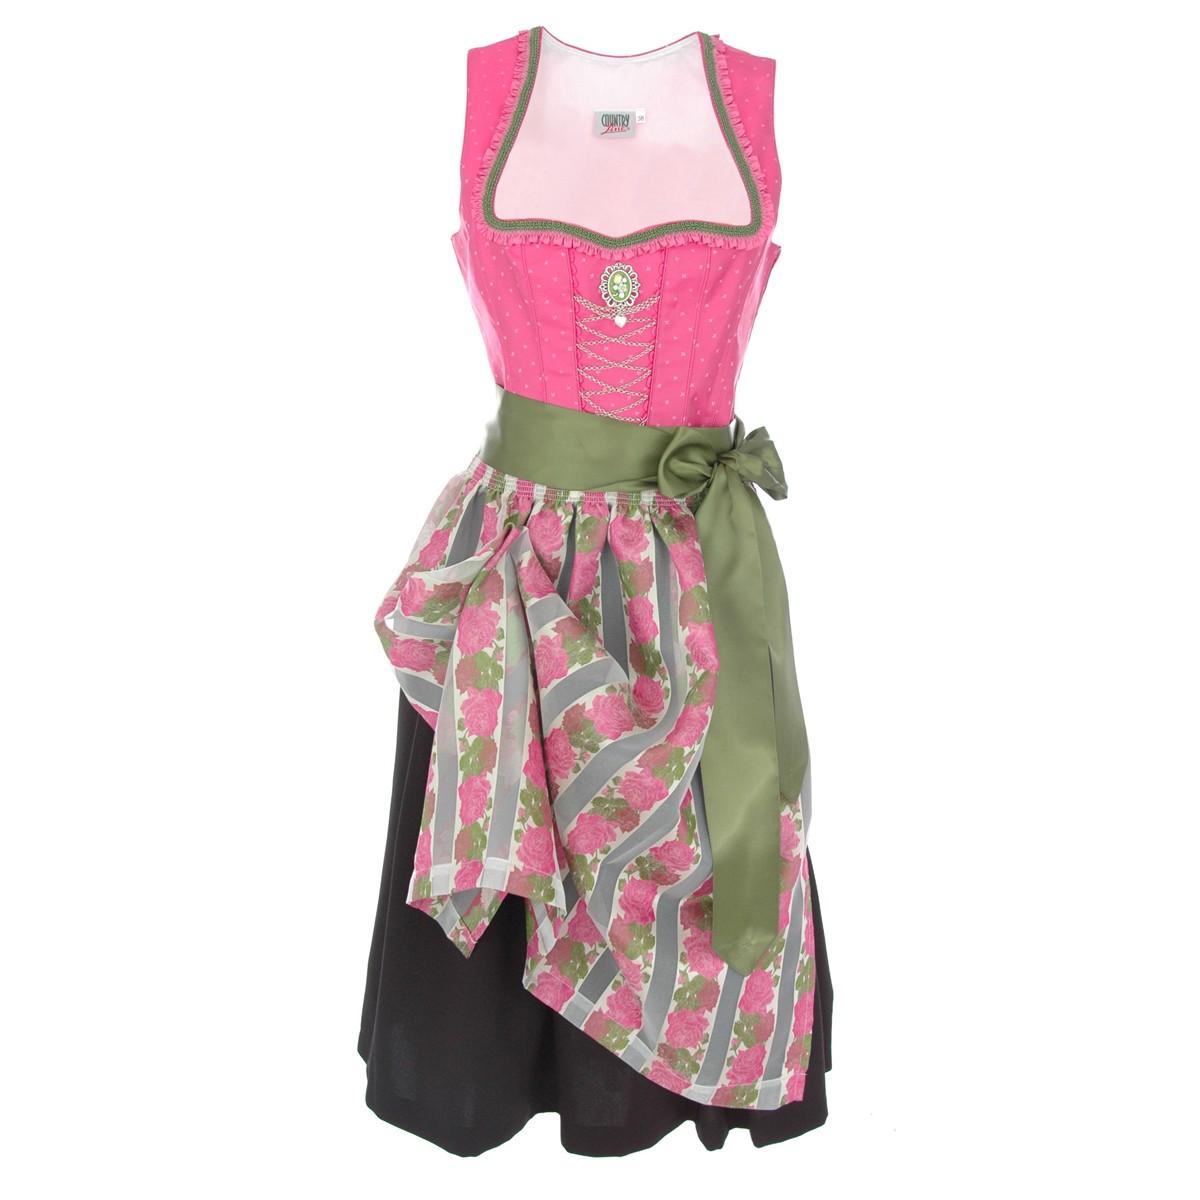 midi dirndl betlindis in pink von country line ebay. Black Bedroom Furniture Sets. Home Design Ideas